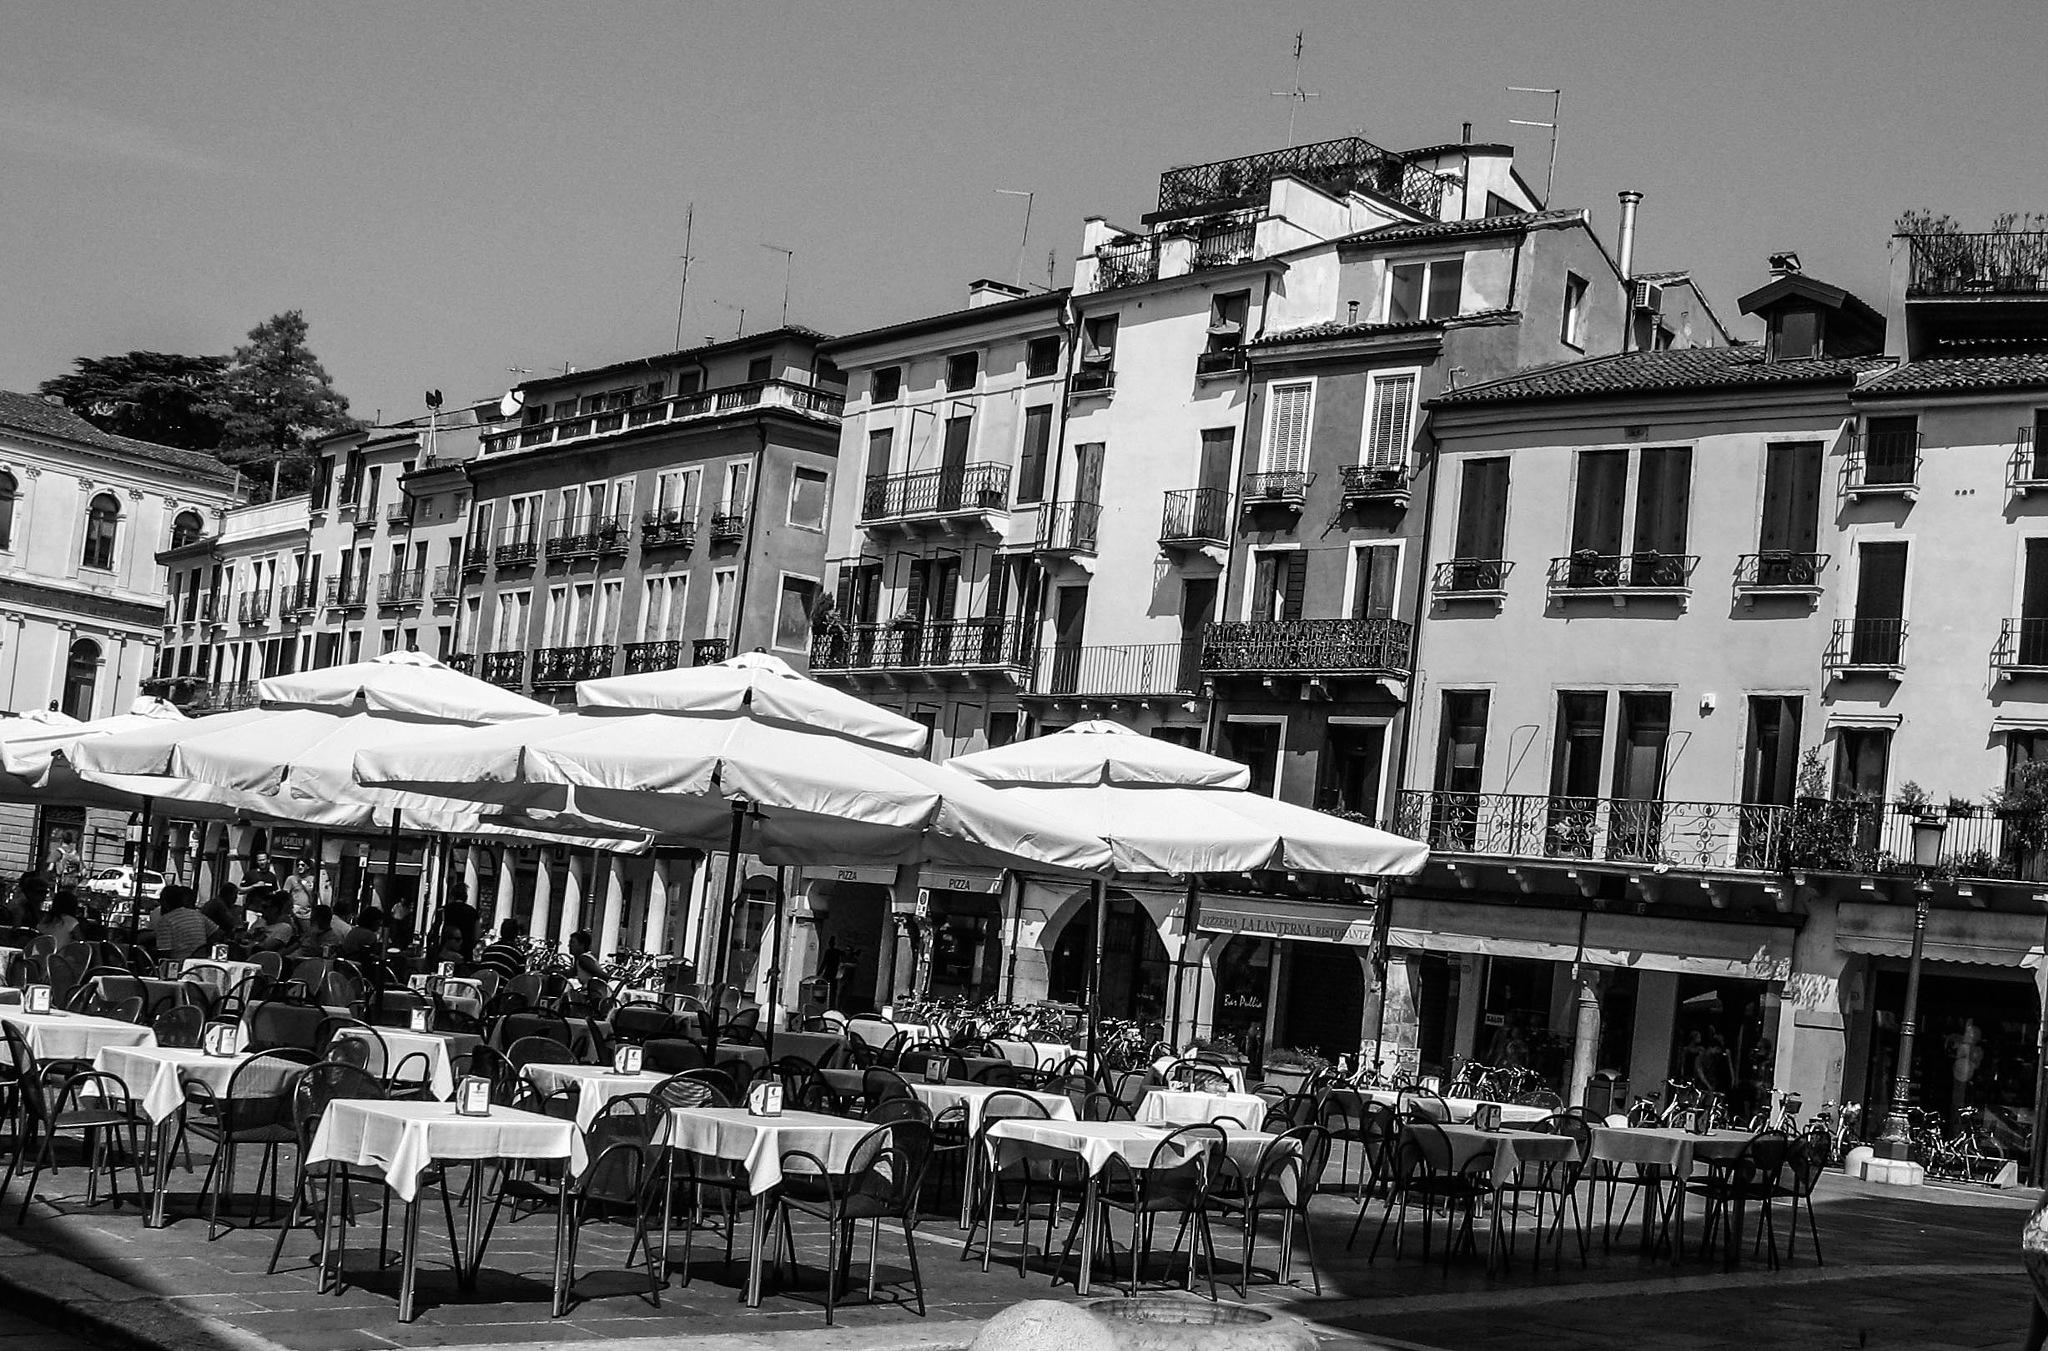 Pomeriggo Caffe in Padua by simie